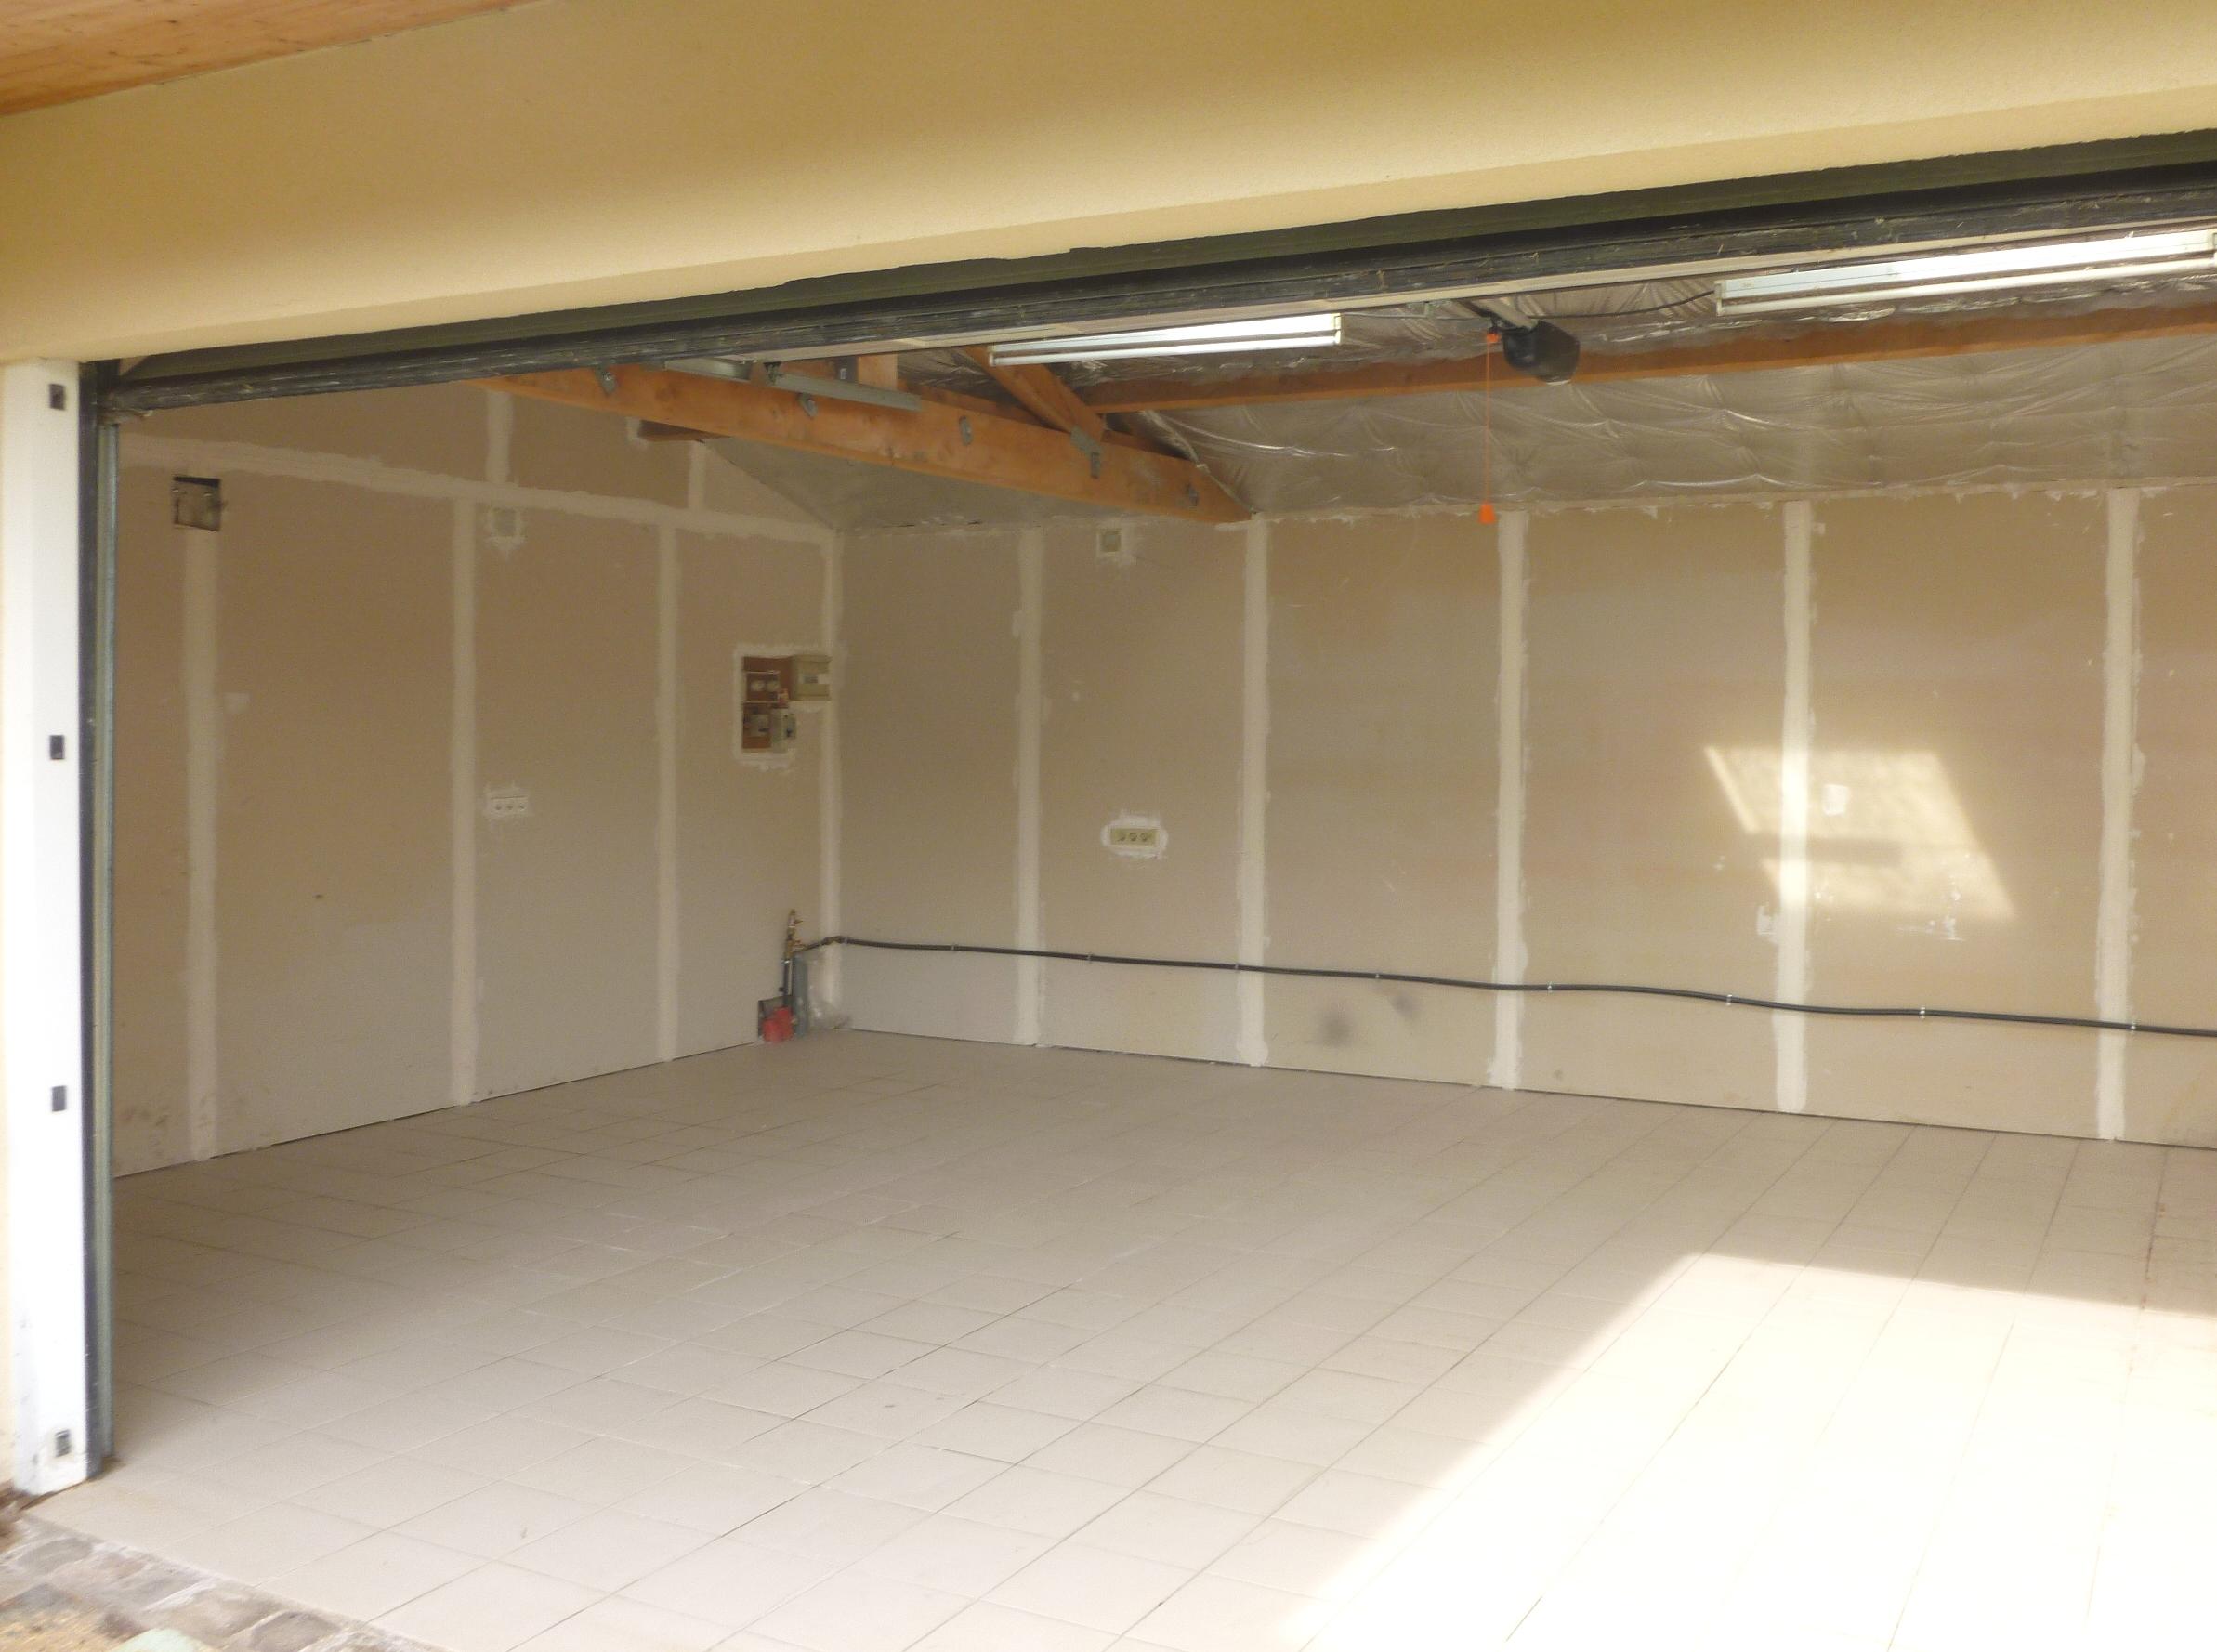 location 10m2 de stockage dans local s curis houilles 78800. Black Bedroom Furniture Sets. Home Design Ideas